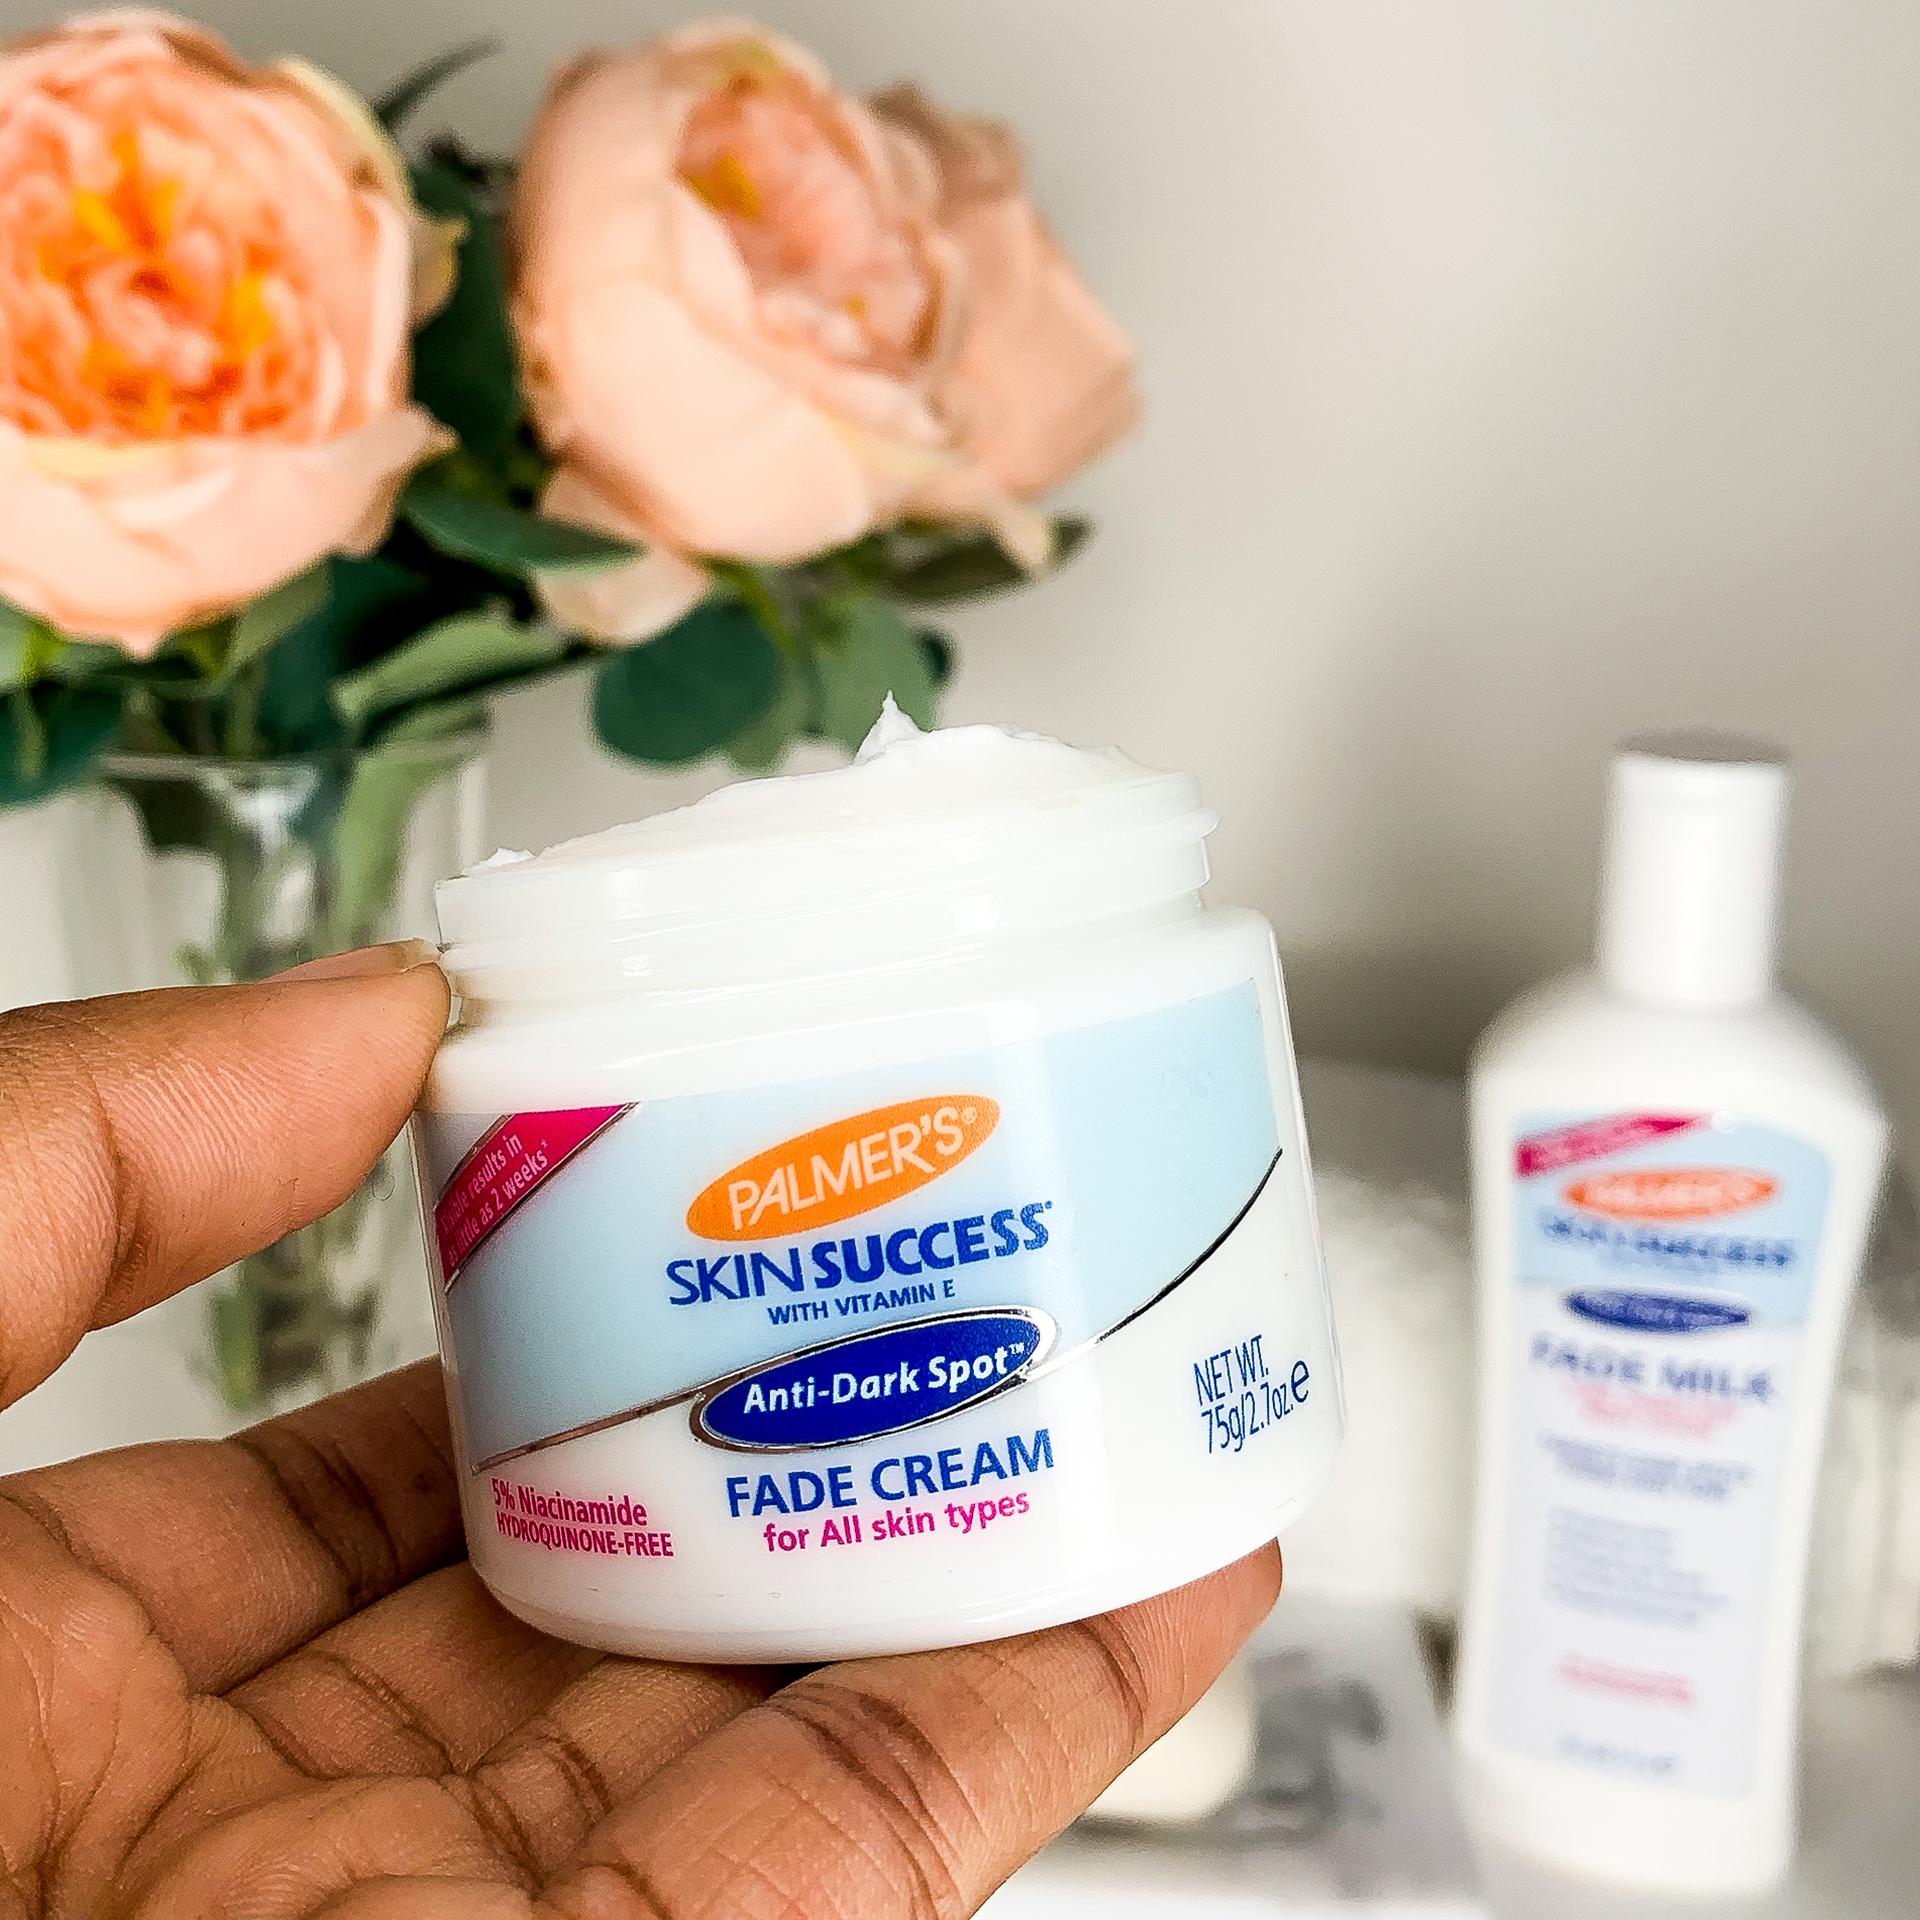 Palmer's Skin Success Anti-Dark Spot Fade Cream, an anti-aging cream with retinol and niacinamide, held in hand